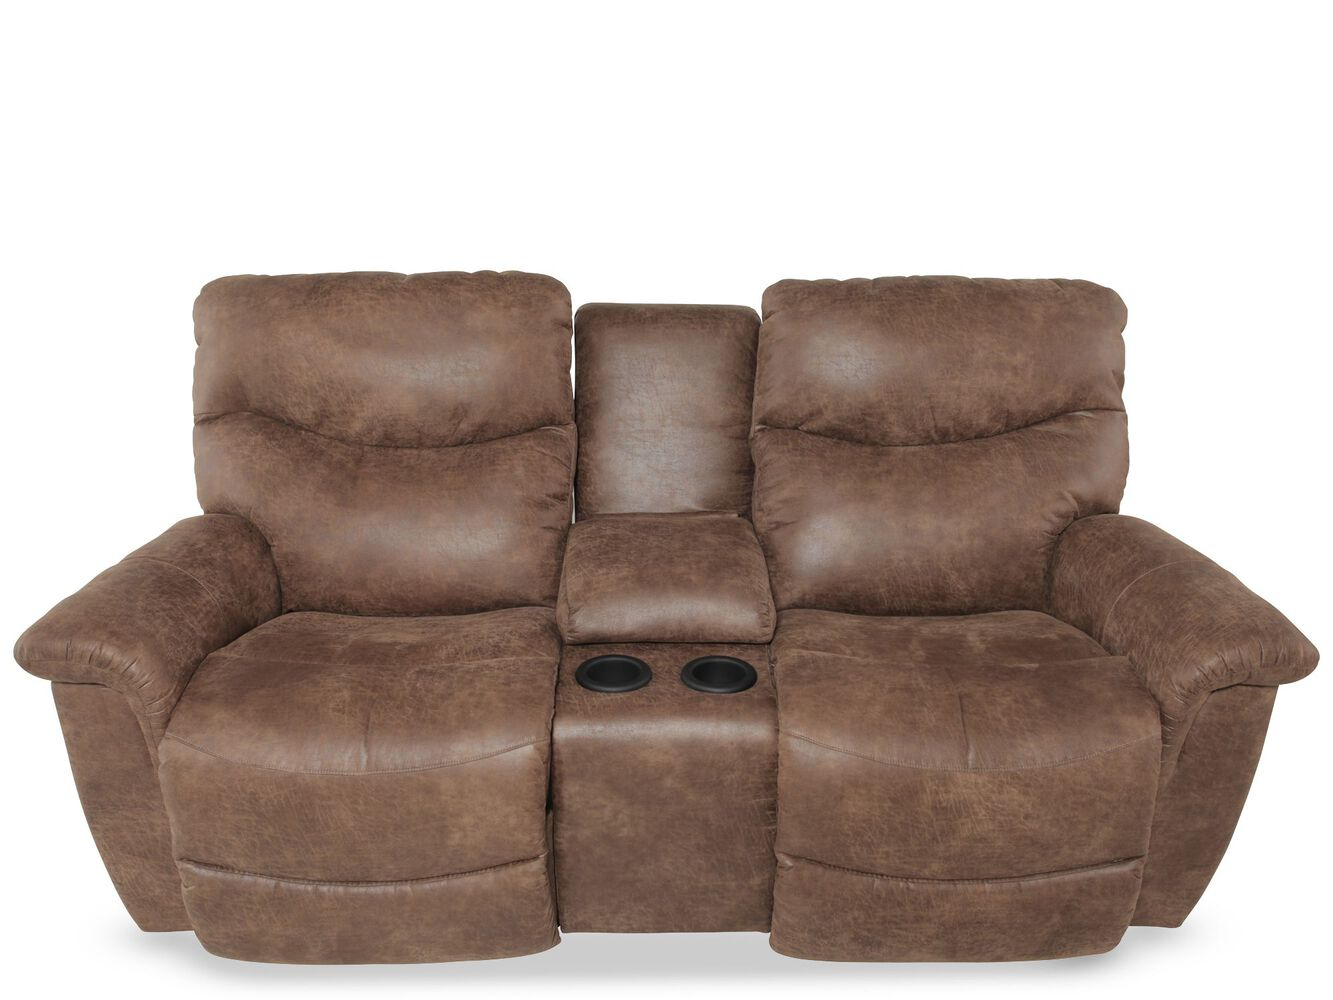 double recliner la z boy mathis brothers. Black Bedroom Furniture Sets. Home Design Ideas